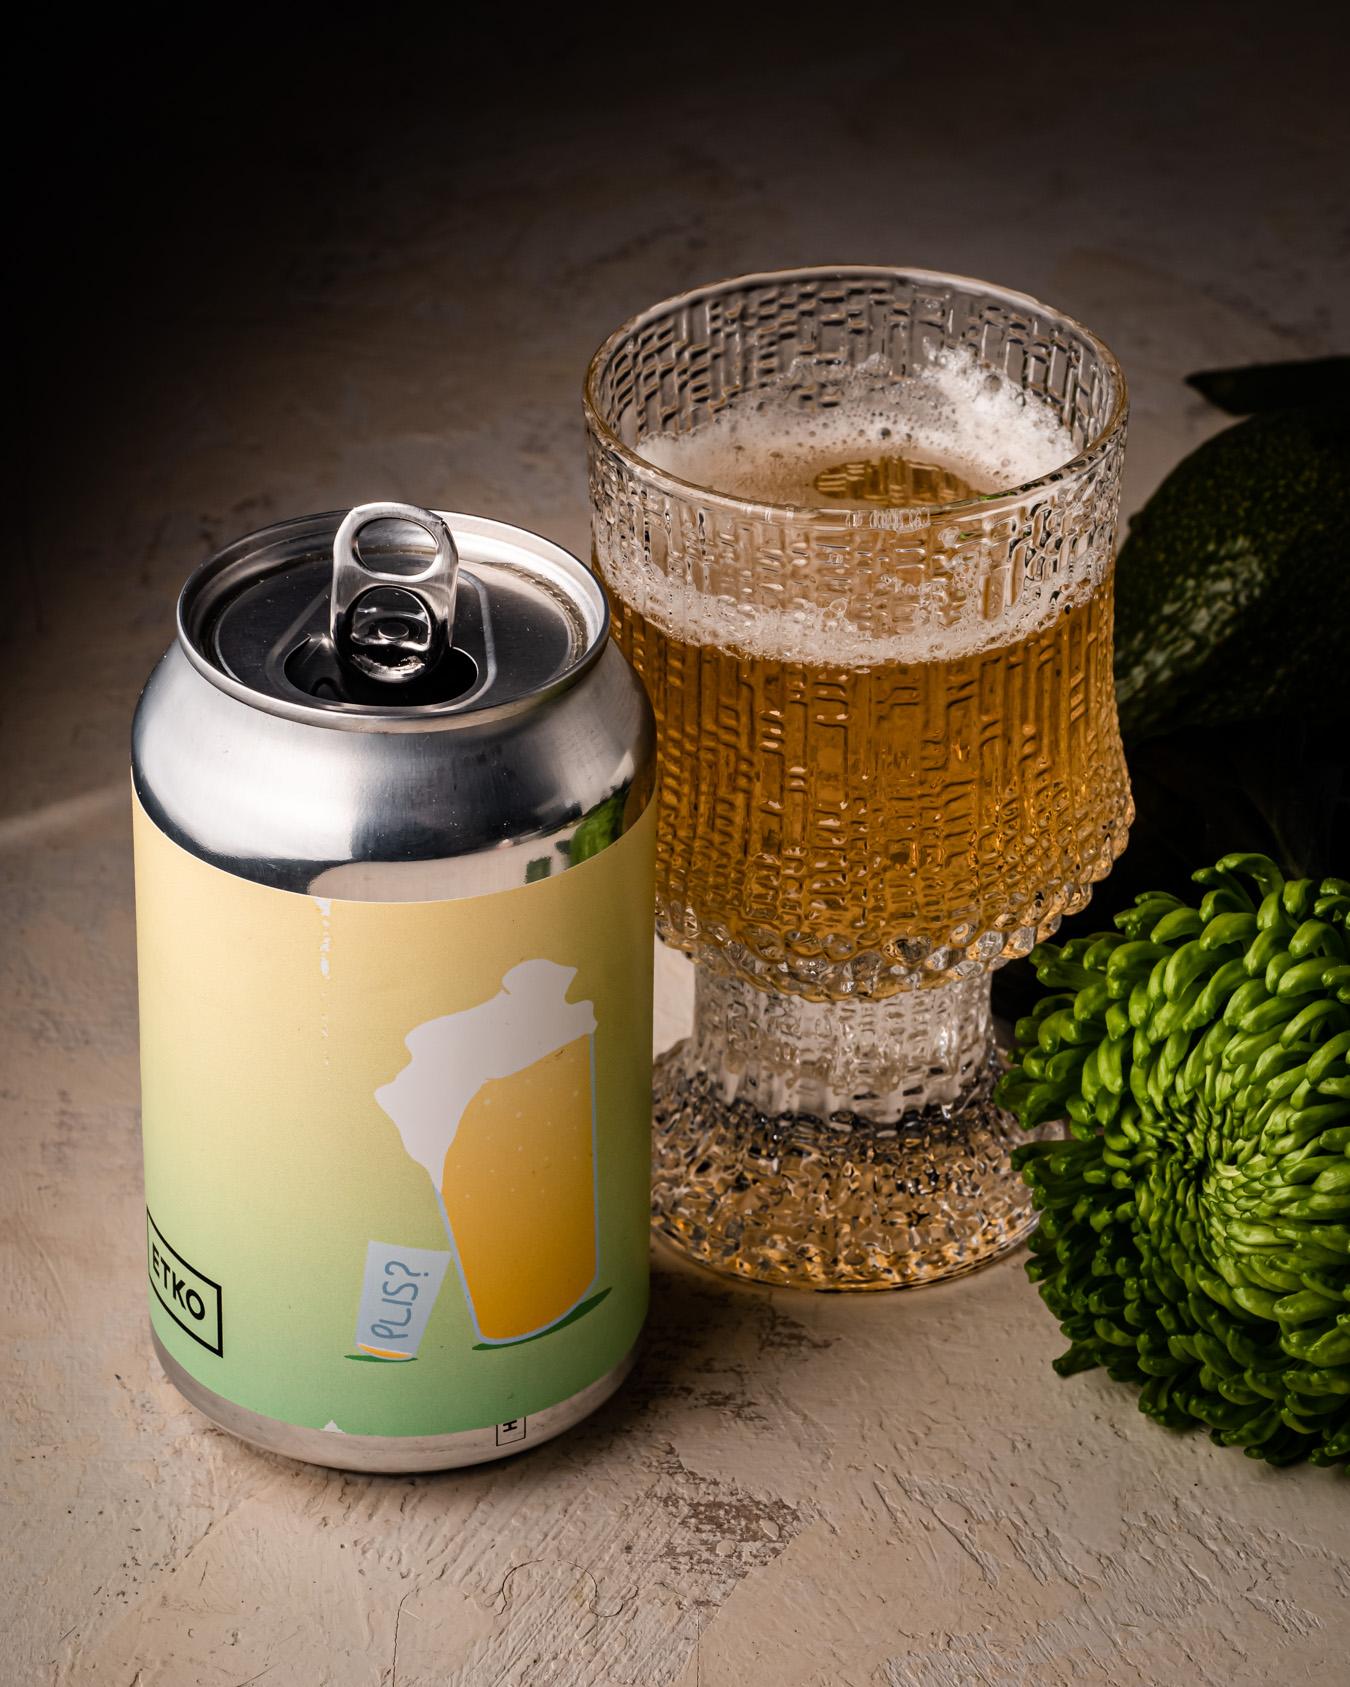 etko brewing